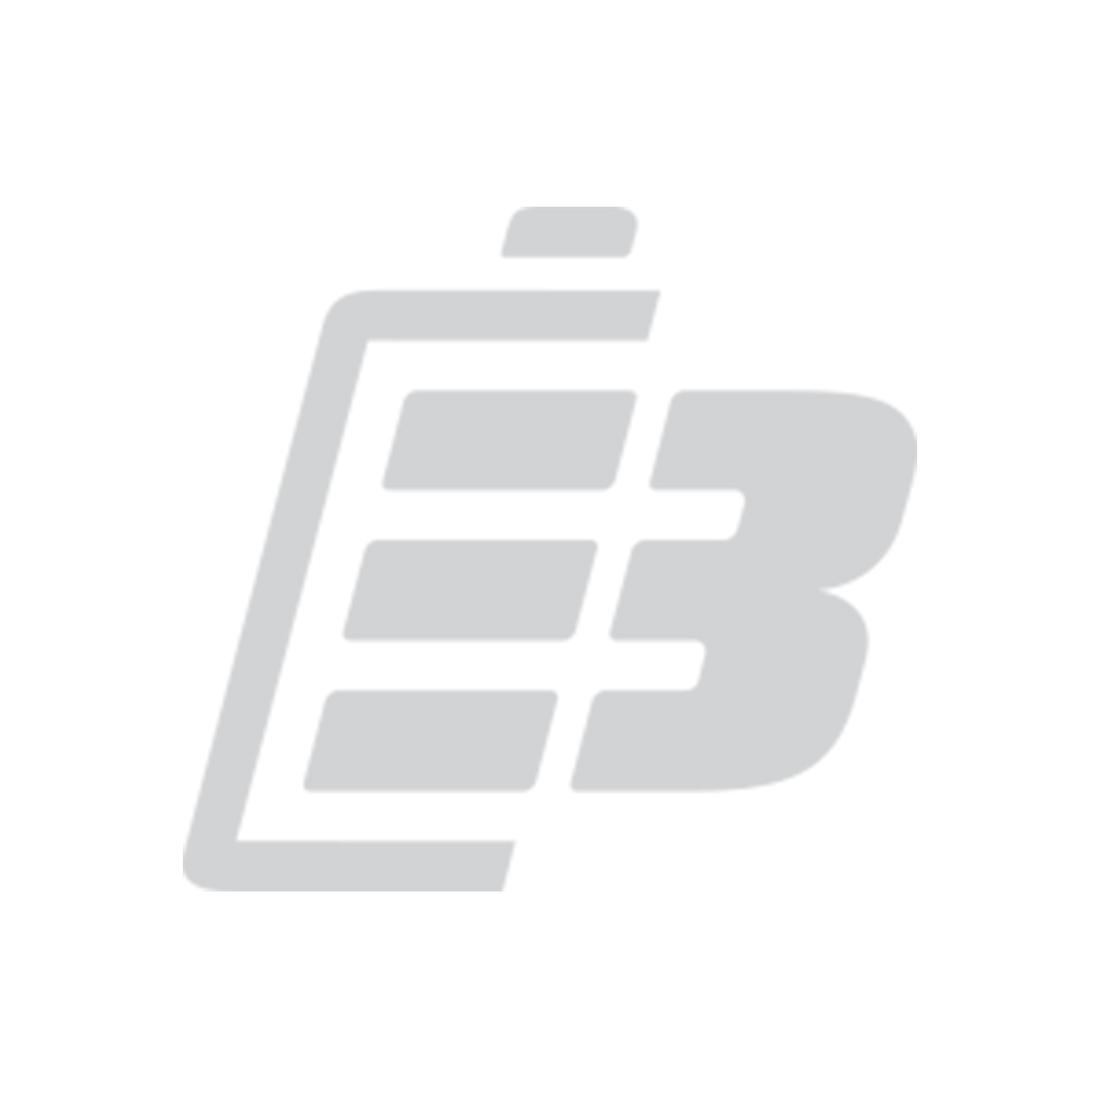 Tablet battery Lenovo IdeaTab S2110_1